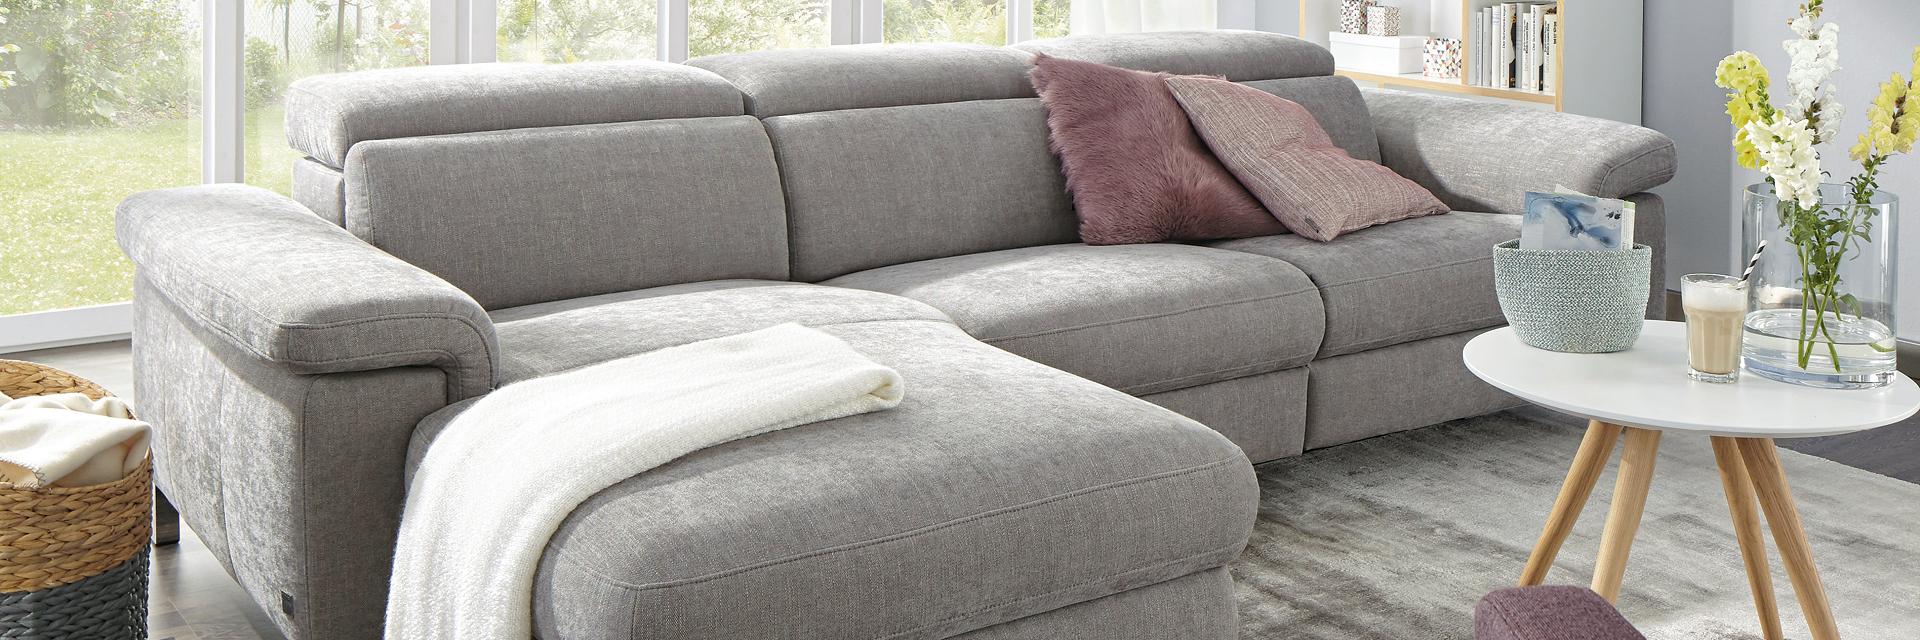 Sofa, Global Family, Almeria